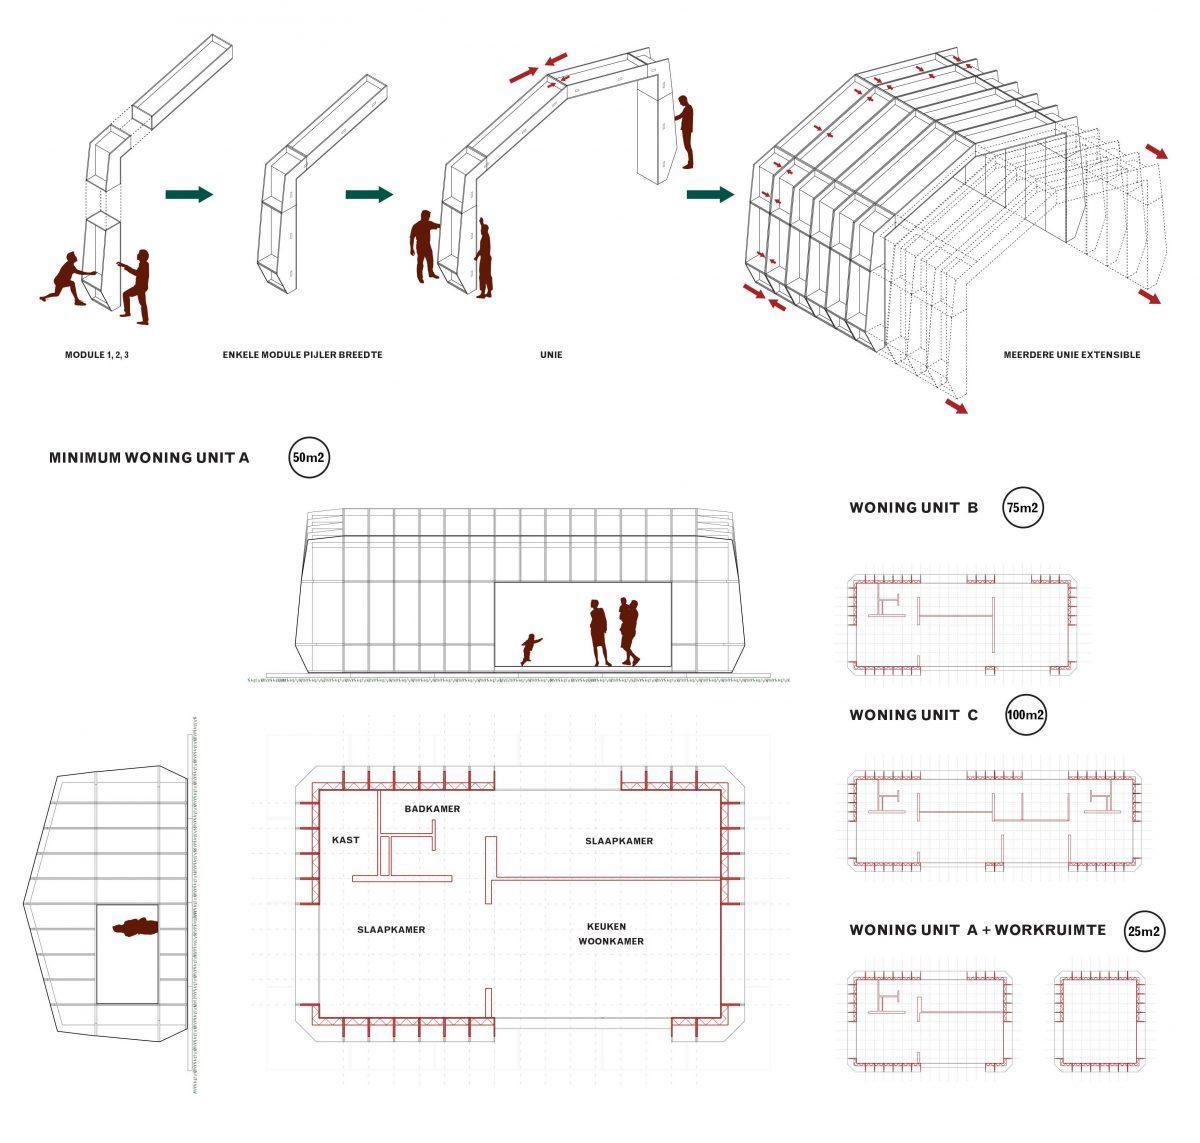 http://www.fabrications.nl/wp-content/uploads/2018/01/scene-04-image-2.jpg